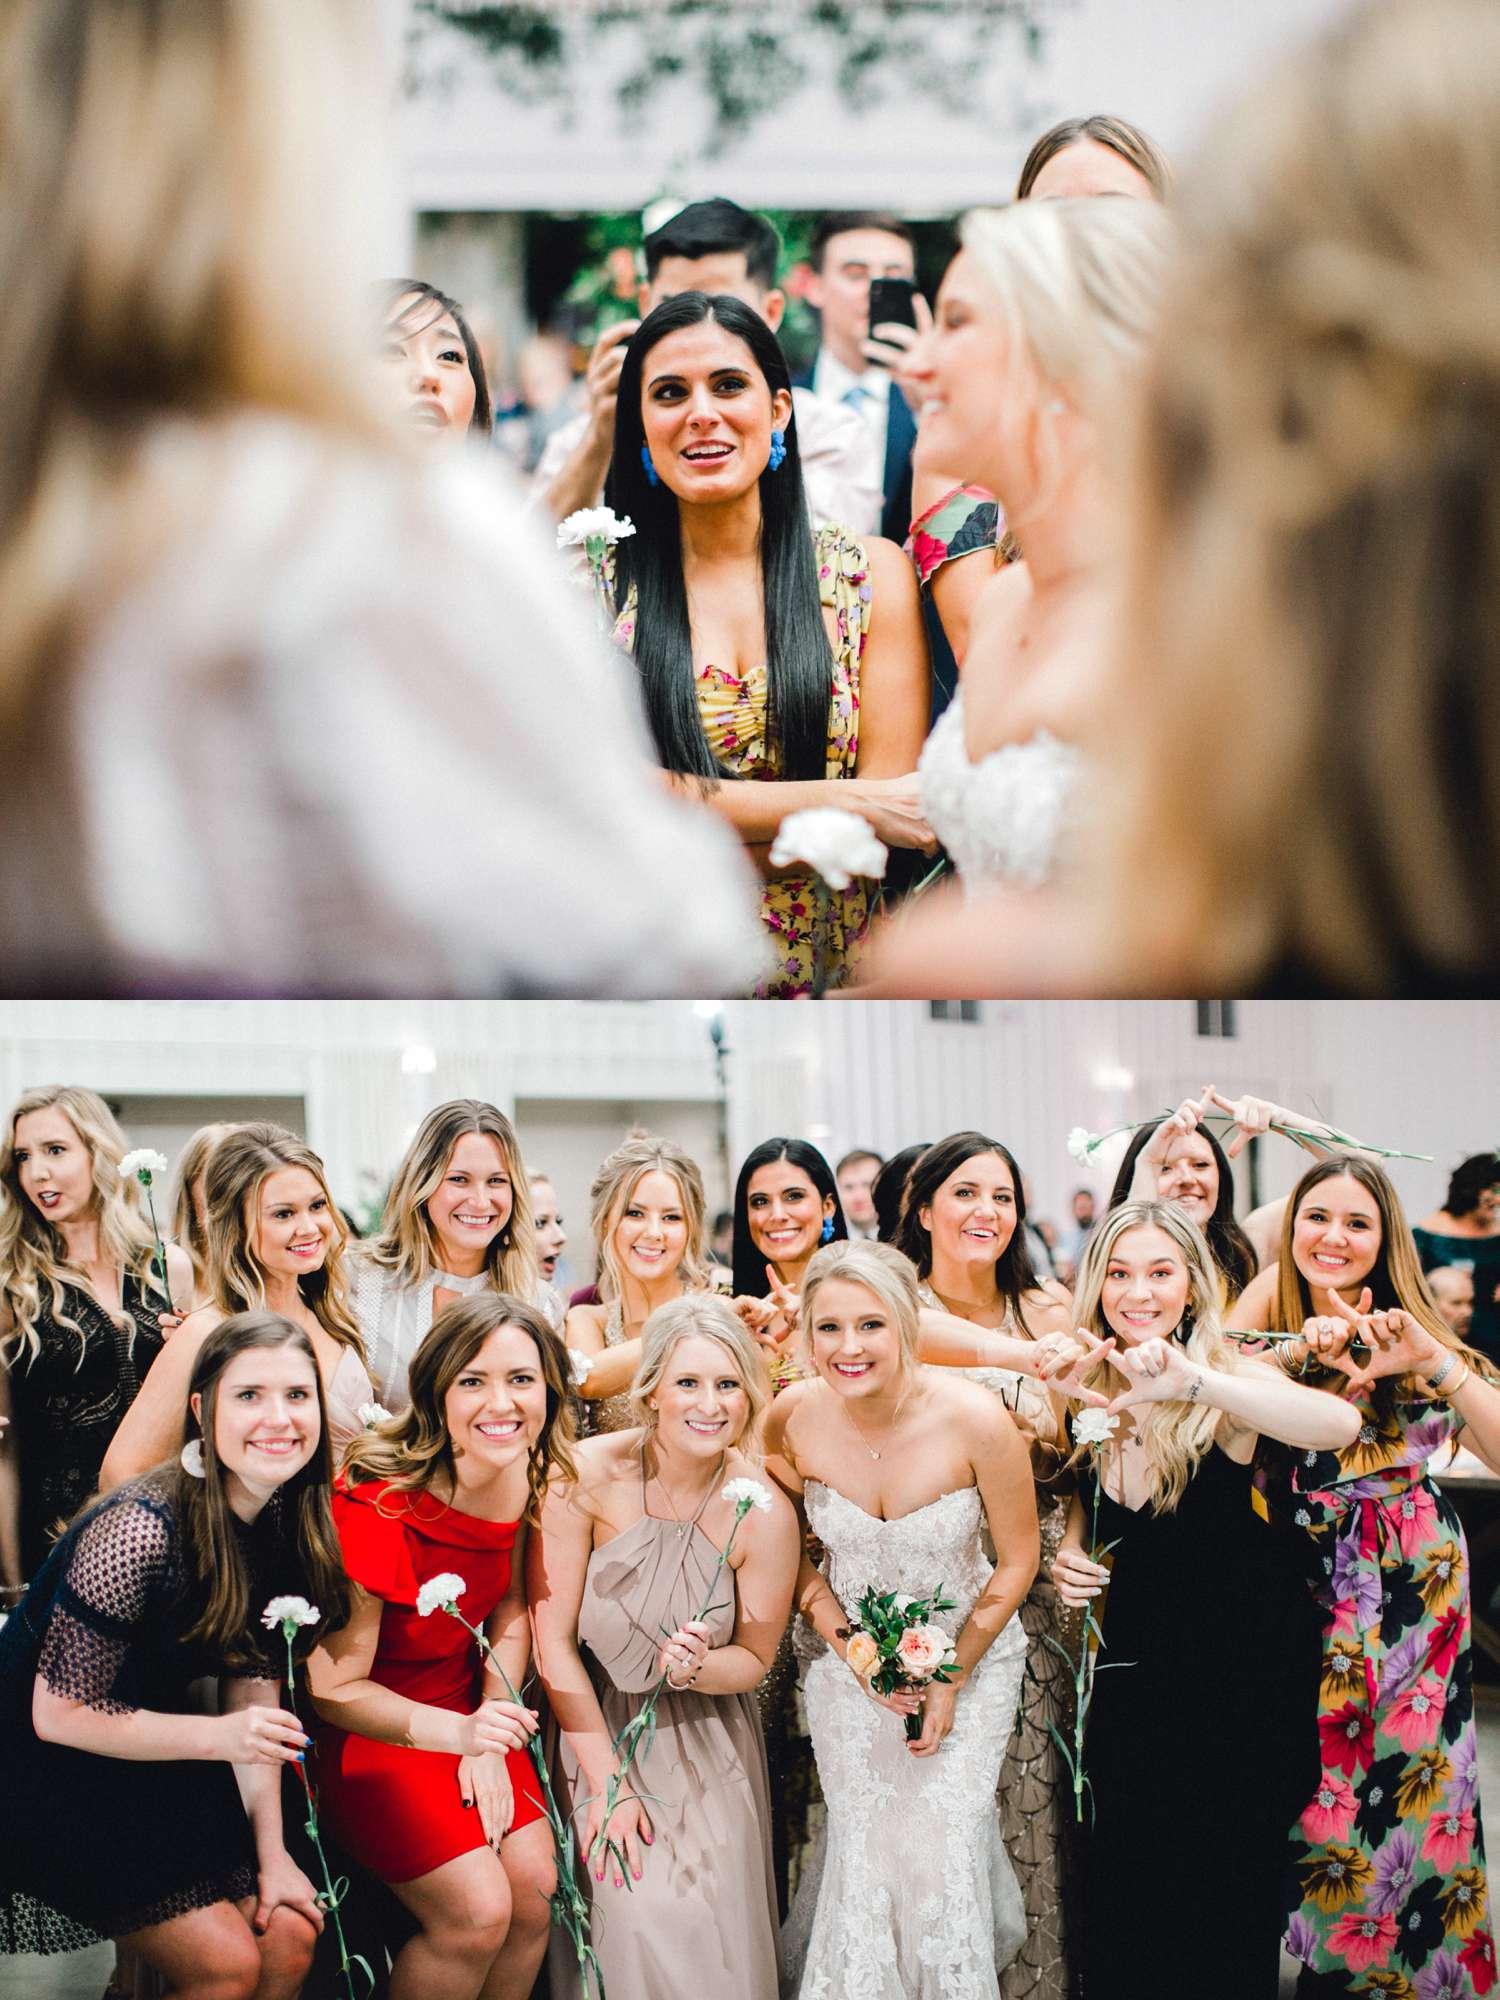 HEBERT_MORGAN_AND_CLAY_ALLEEJ_THE_FARMHOUSE_MONTGOMERY_TEXAS_WEDDING_0204.jpg